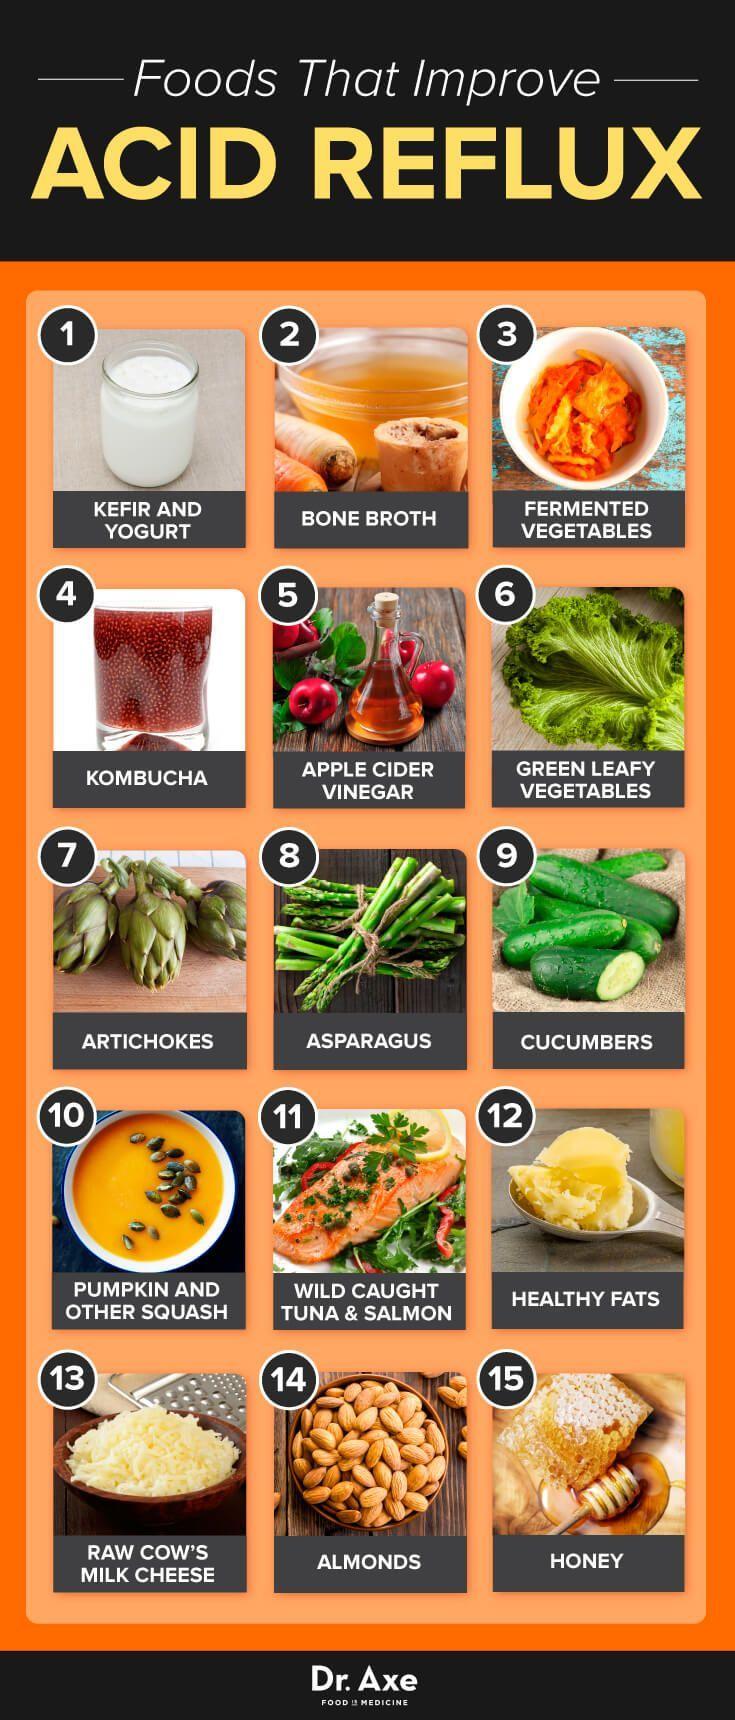 Acid Reflux Diet Best Foods Foods To Avoid Supplements That Help